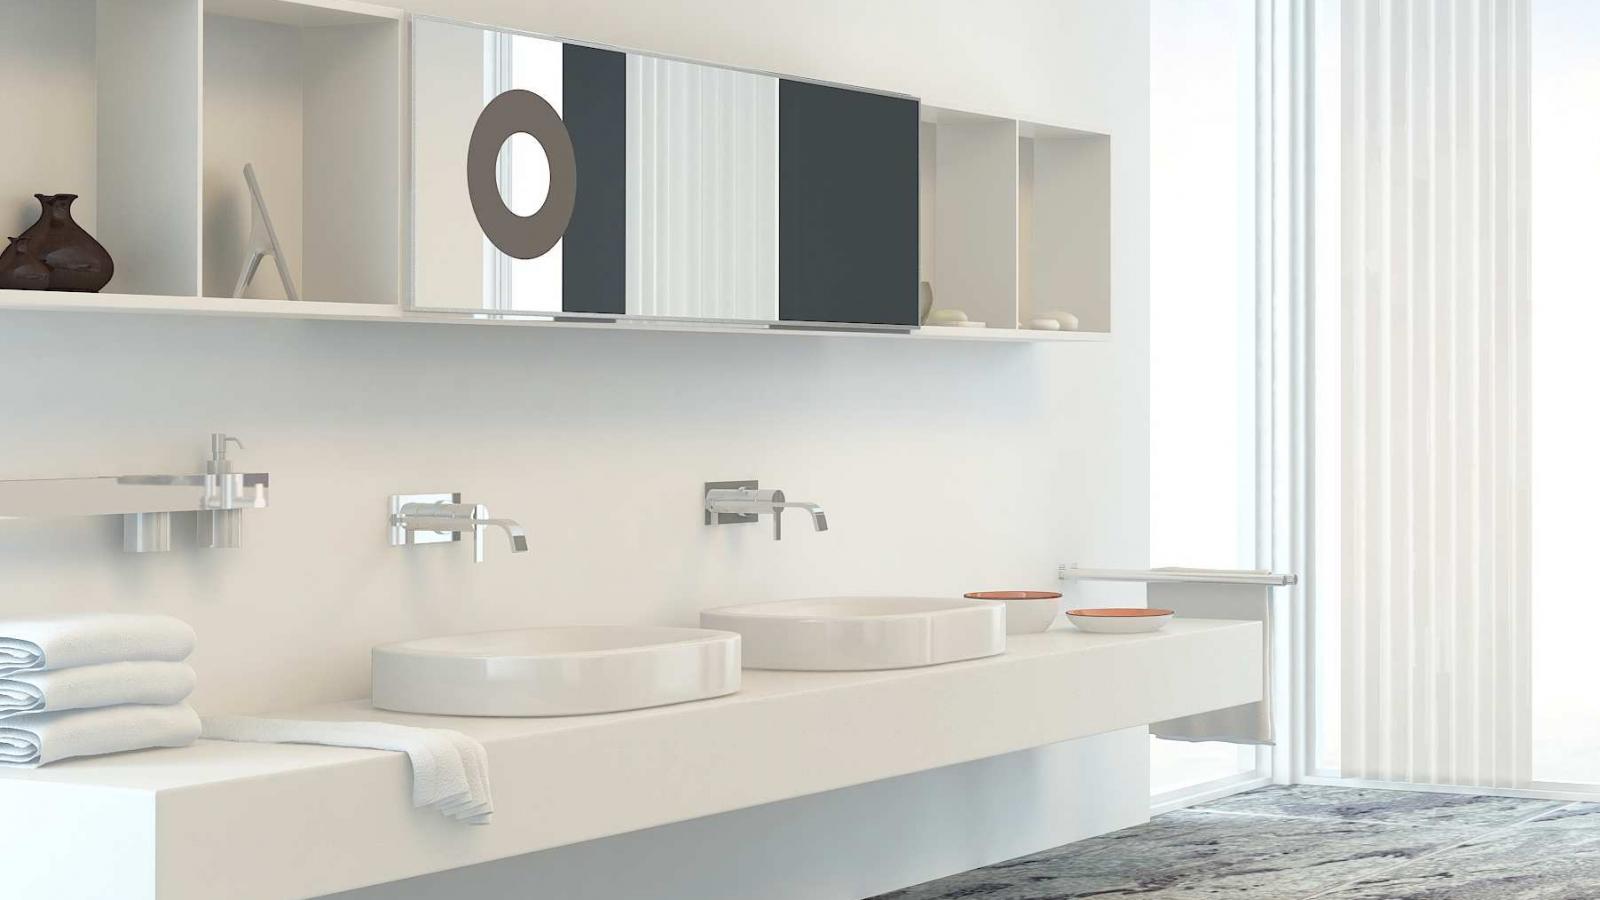 Commercial washroom vanity units